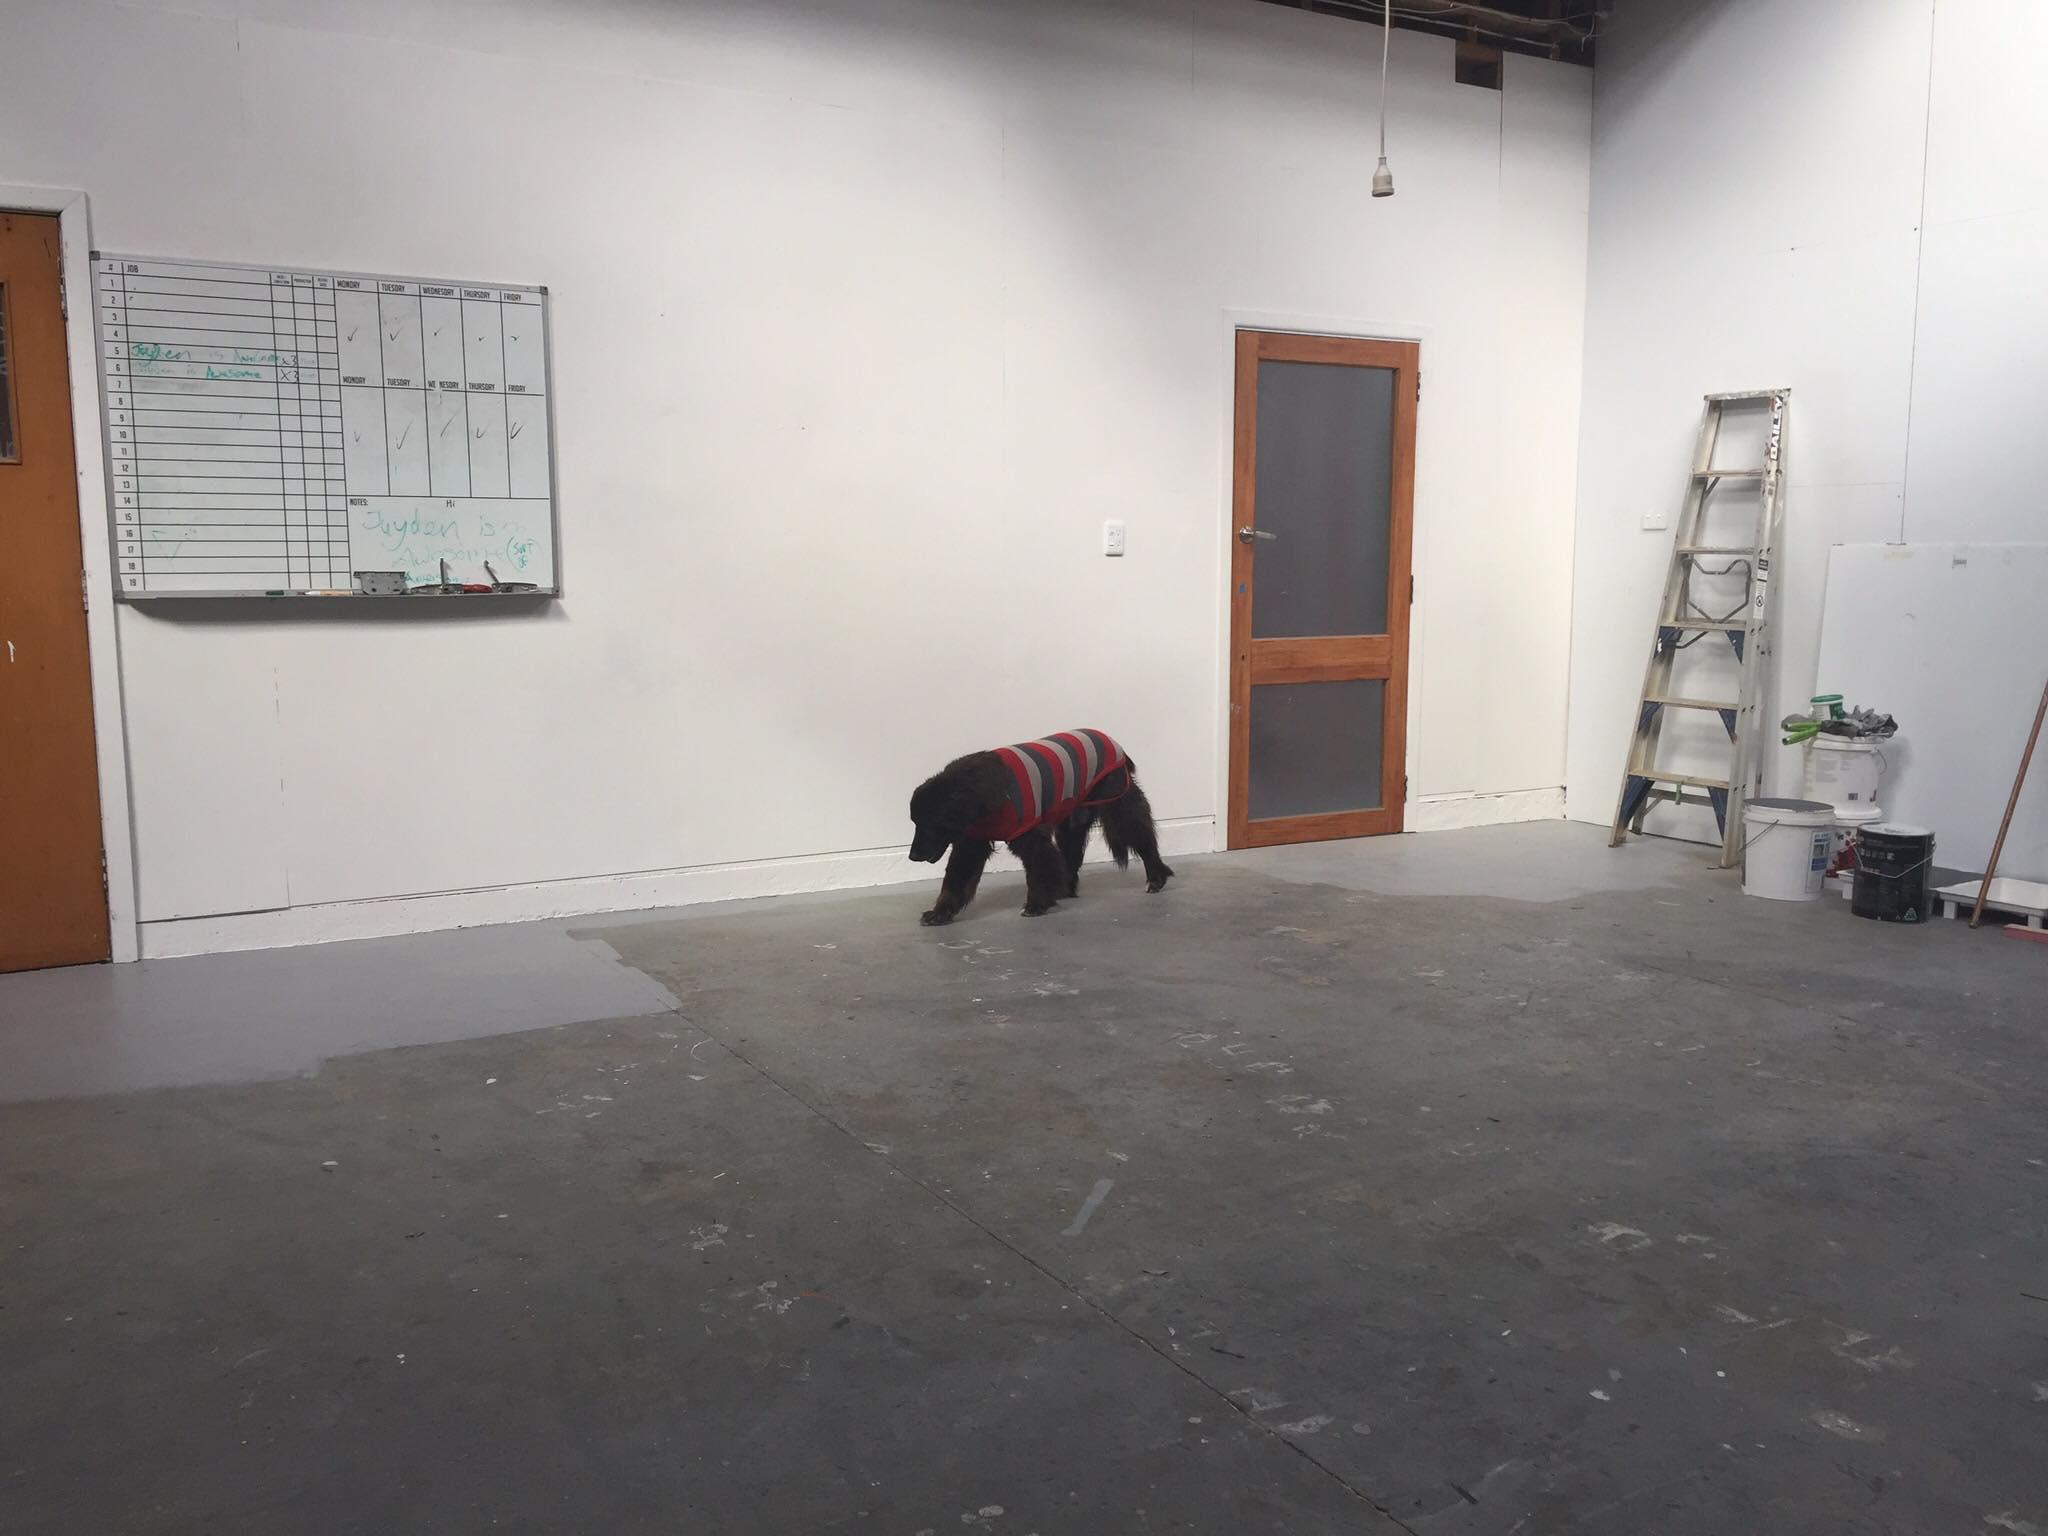 dog-checks-new-facility.jpg